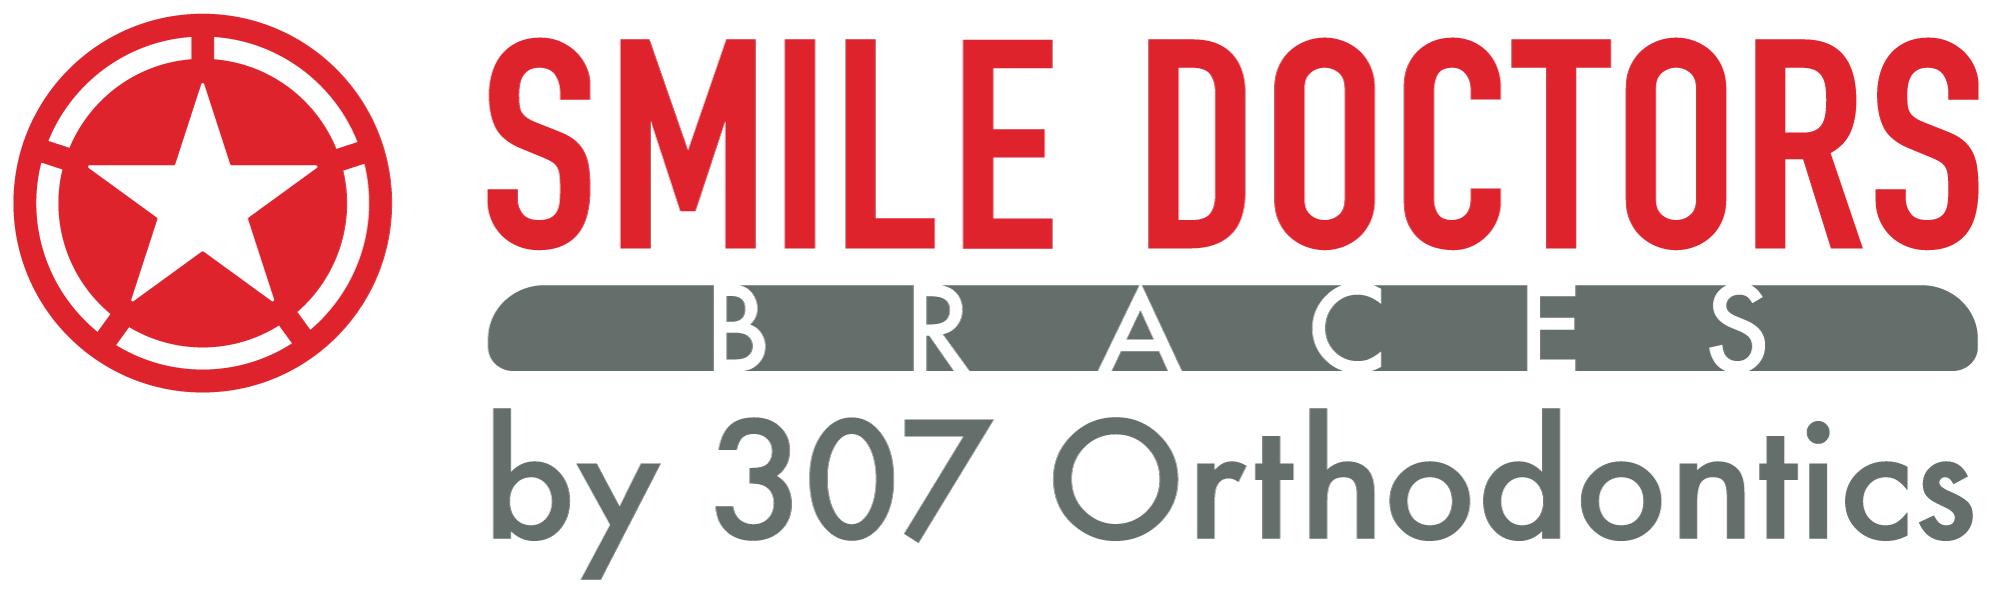 Smile Doctors Kids by 307 Orthodontics Club Membership